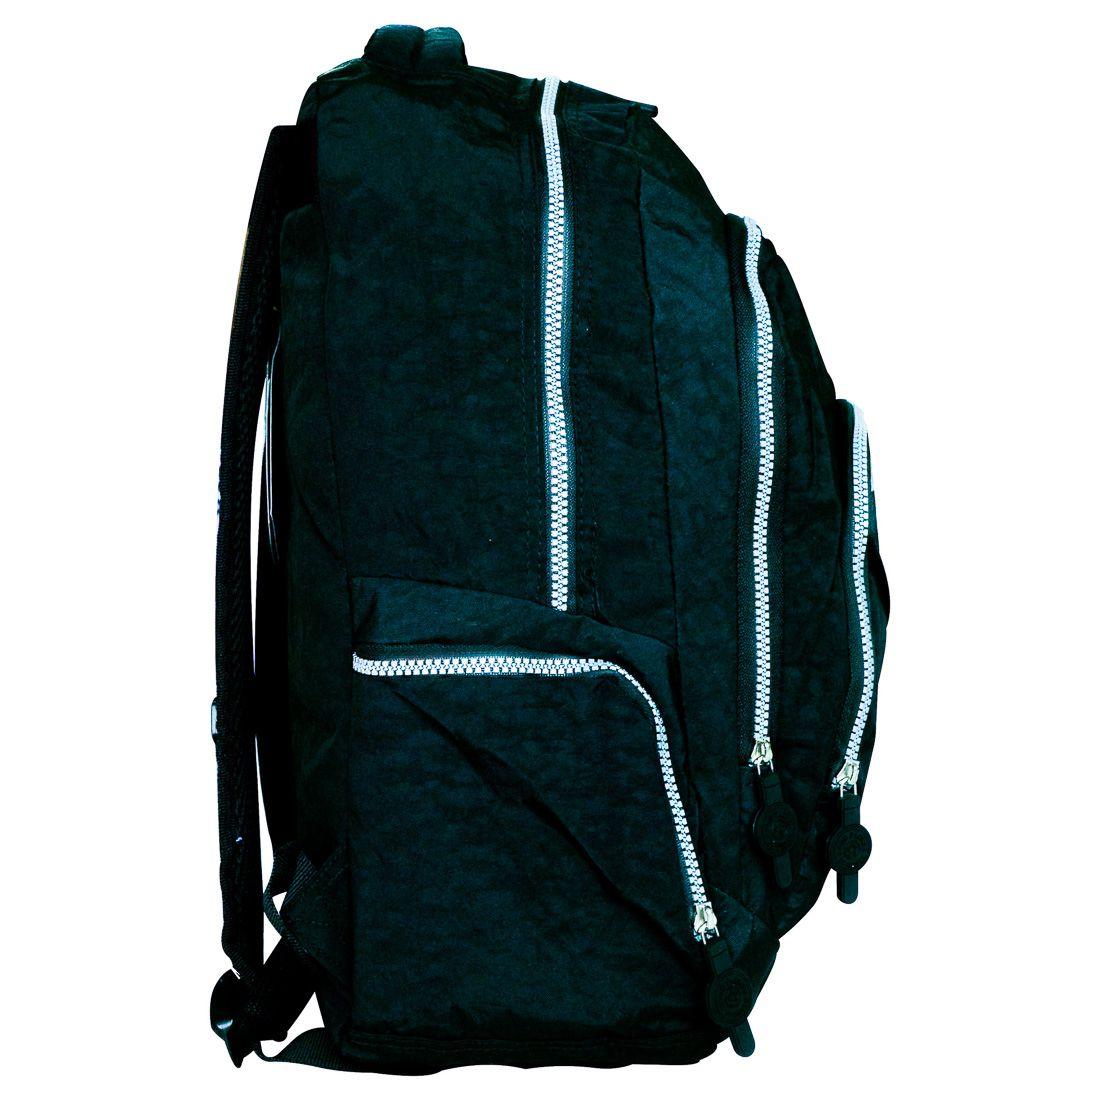 Mochila Escolar para Notebook Seanite Preta ML14008